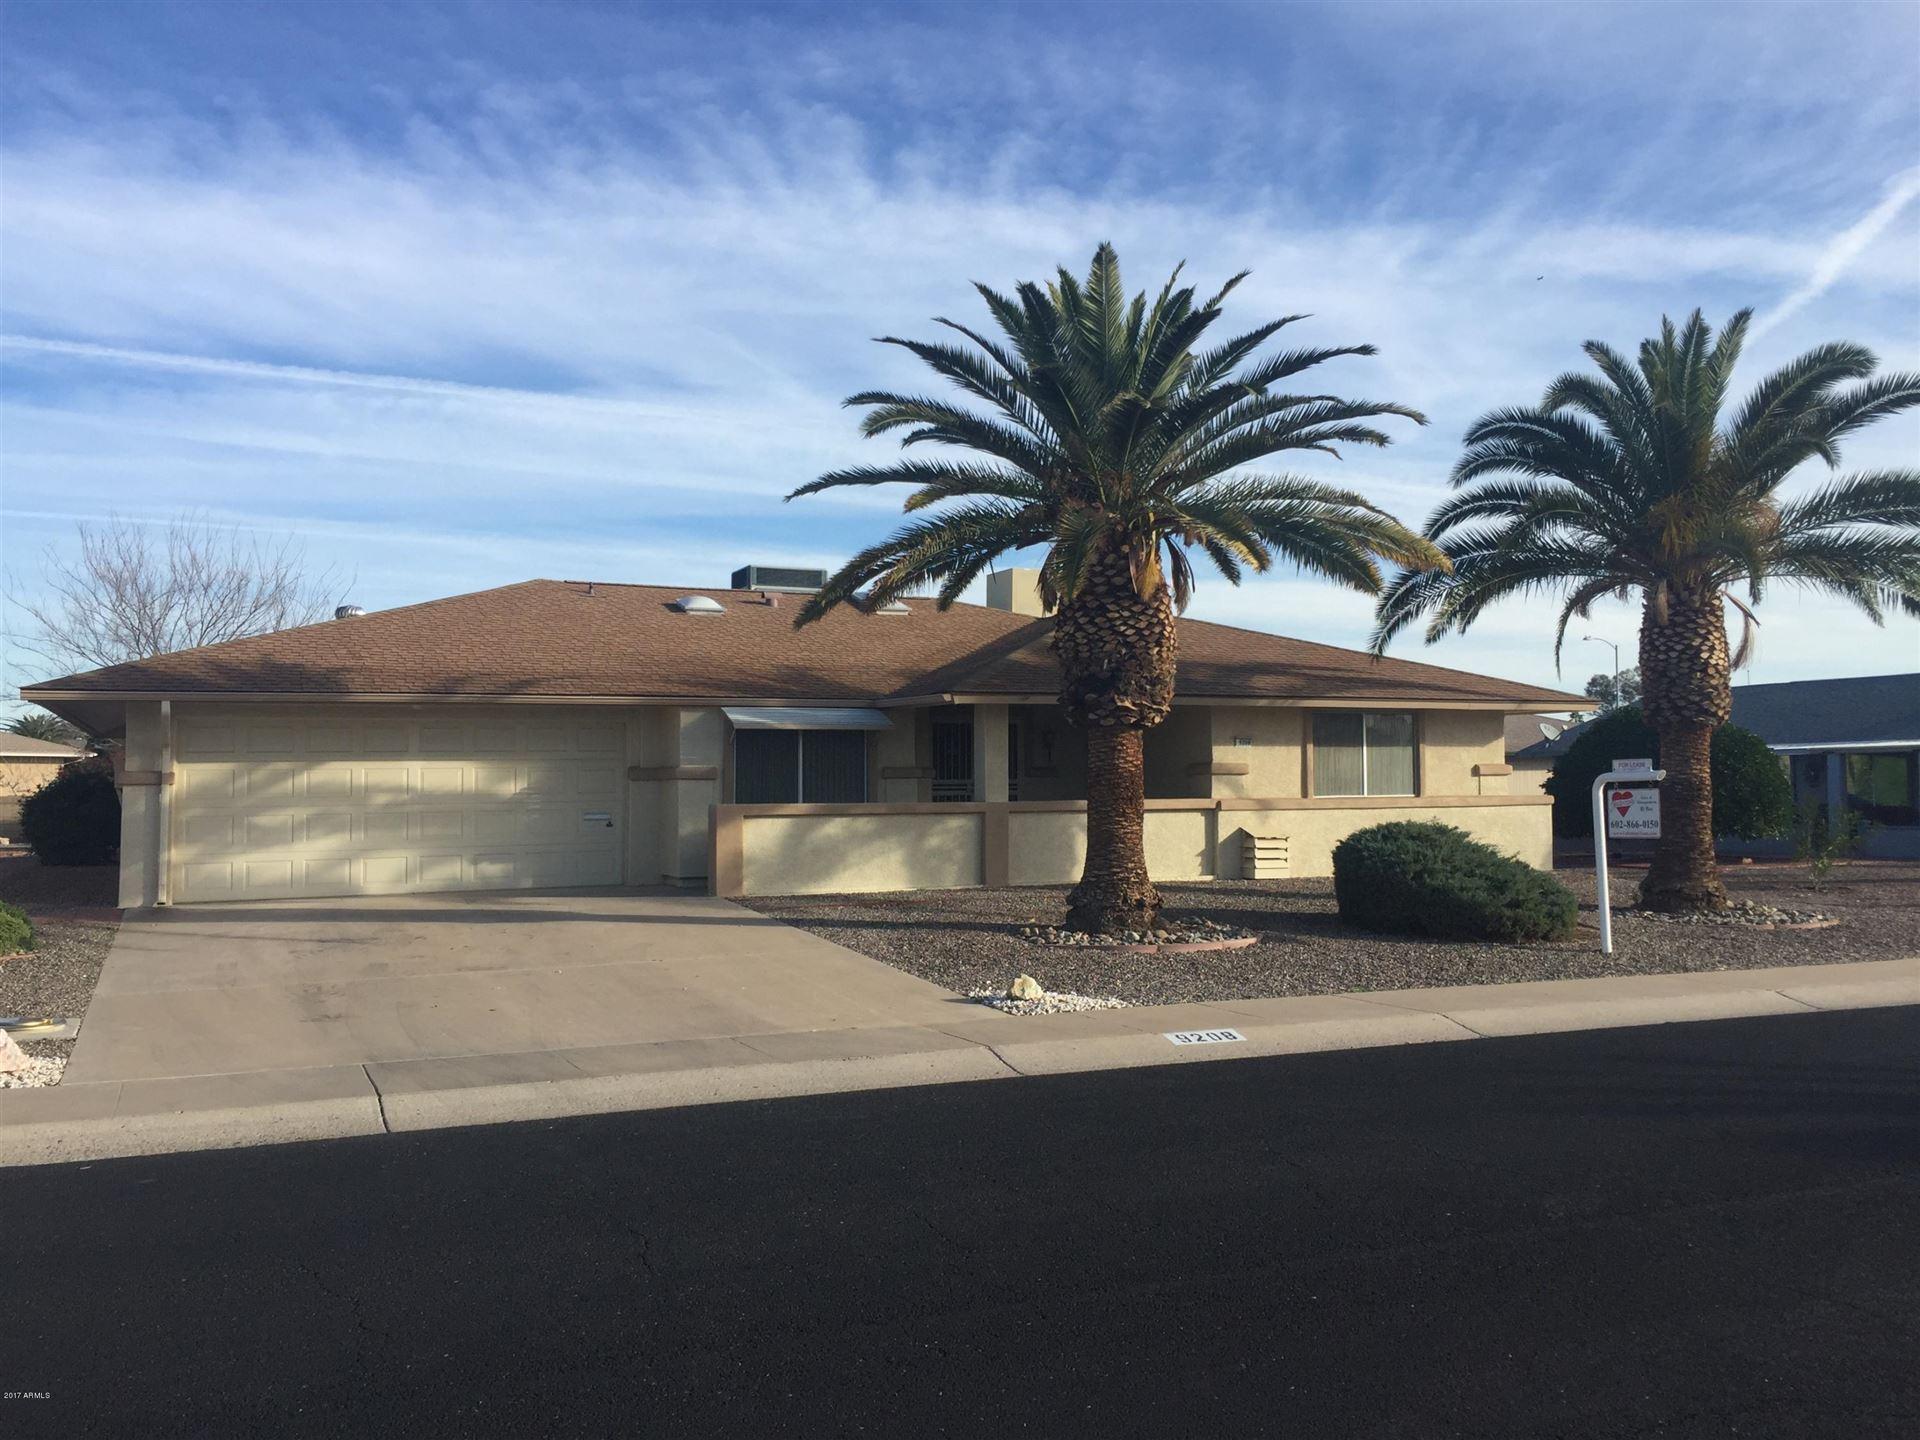 Photo of 9208 W ELKHORN Drive, Sun City, AZ 85351 (MLS # 6198588)